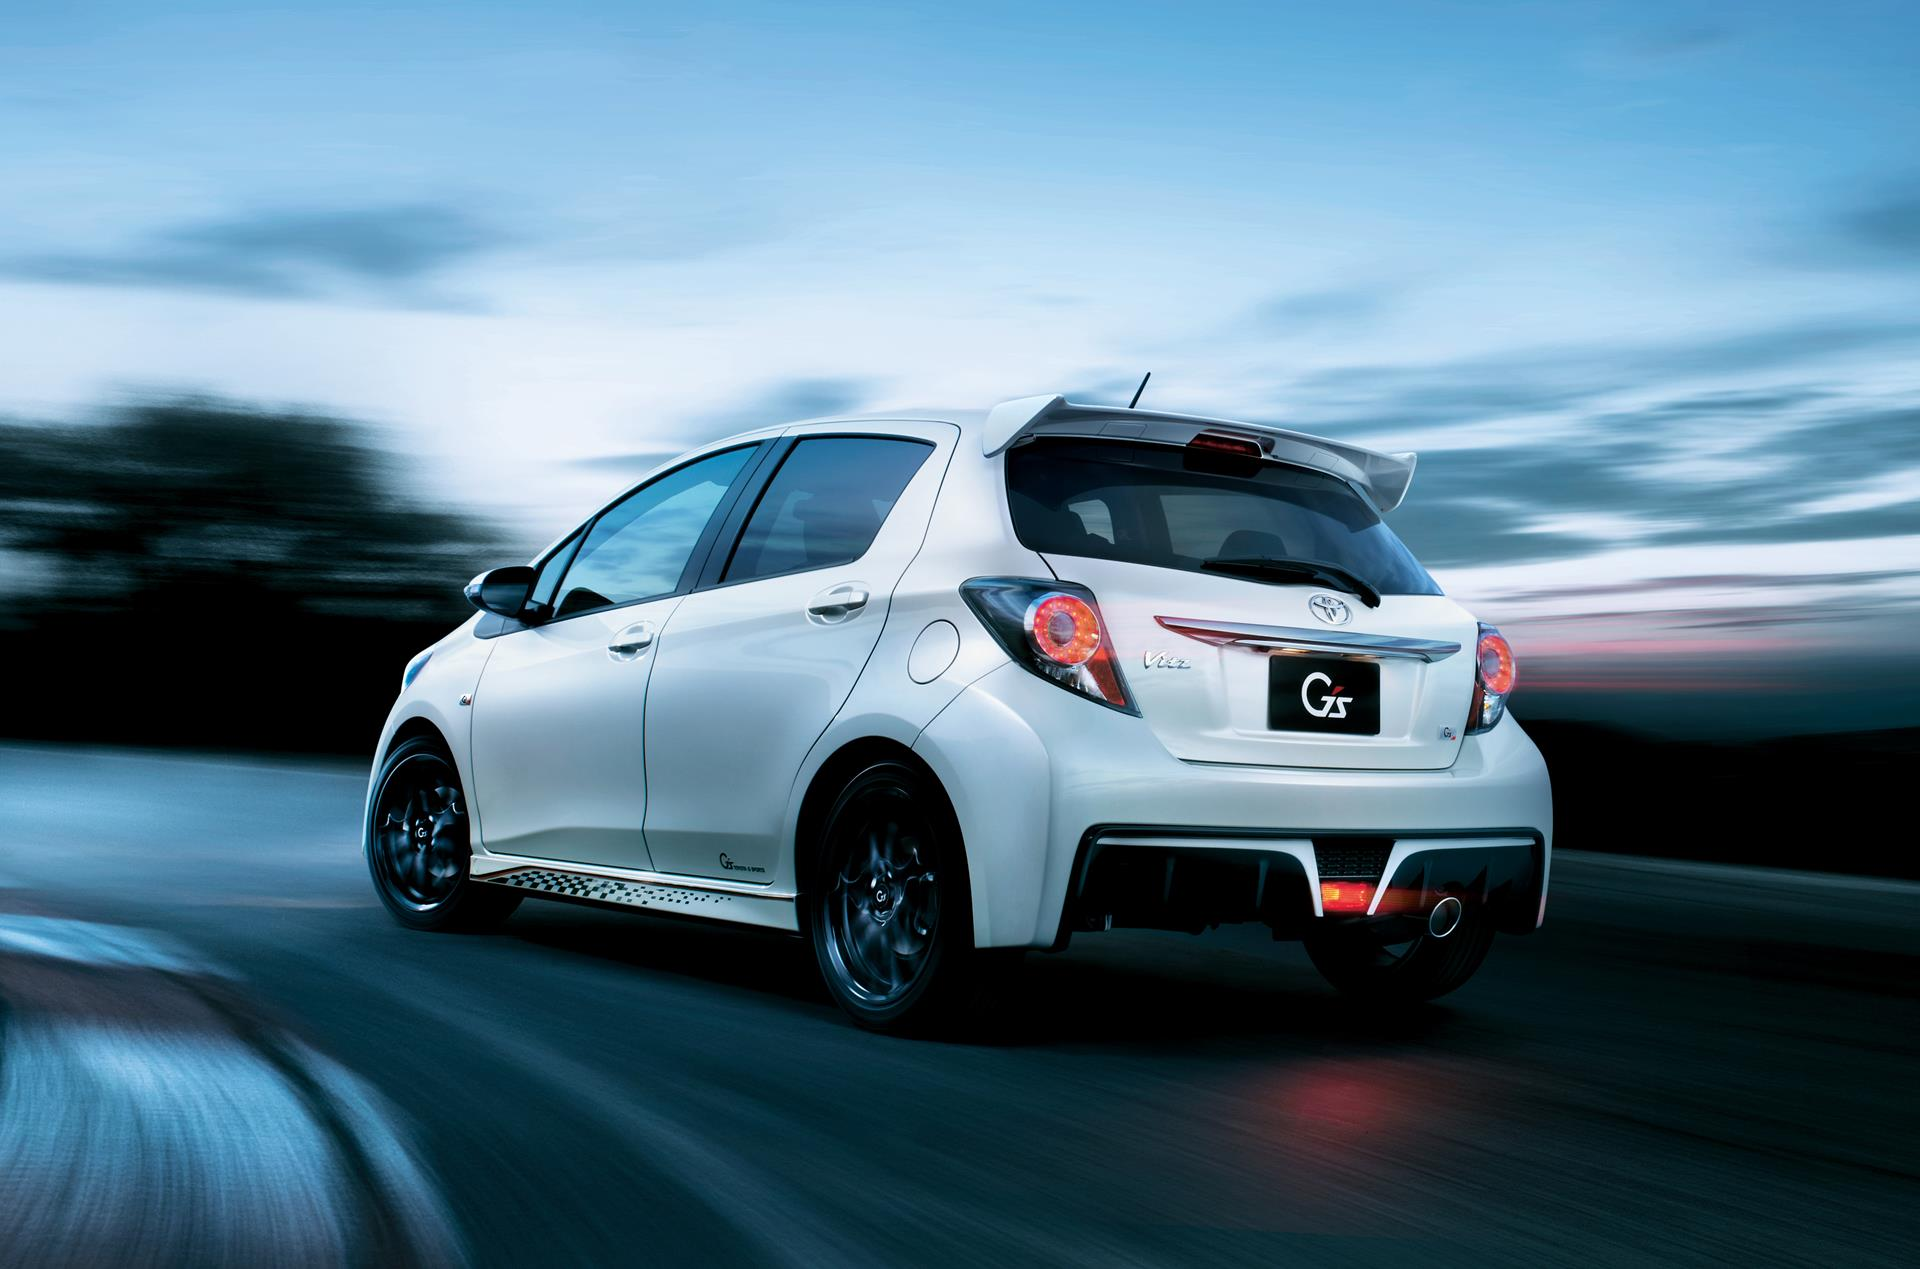 Nissan Maxima 2018 >> Toyota Yaris (Vitz) Gets Aygo-Style Facelift - autoevolution